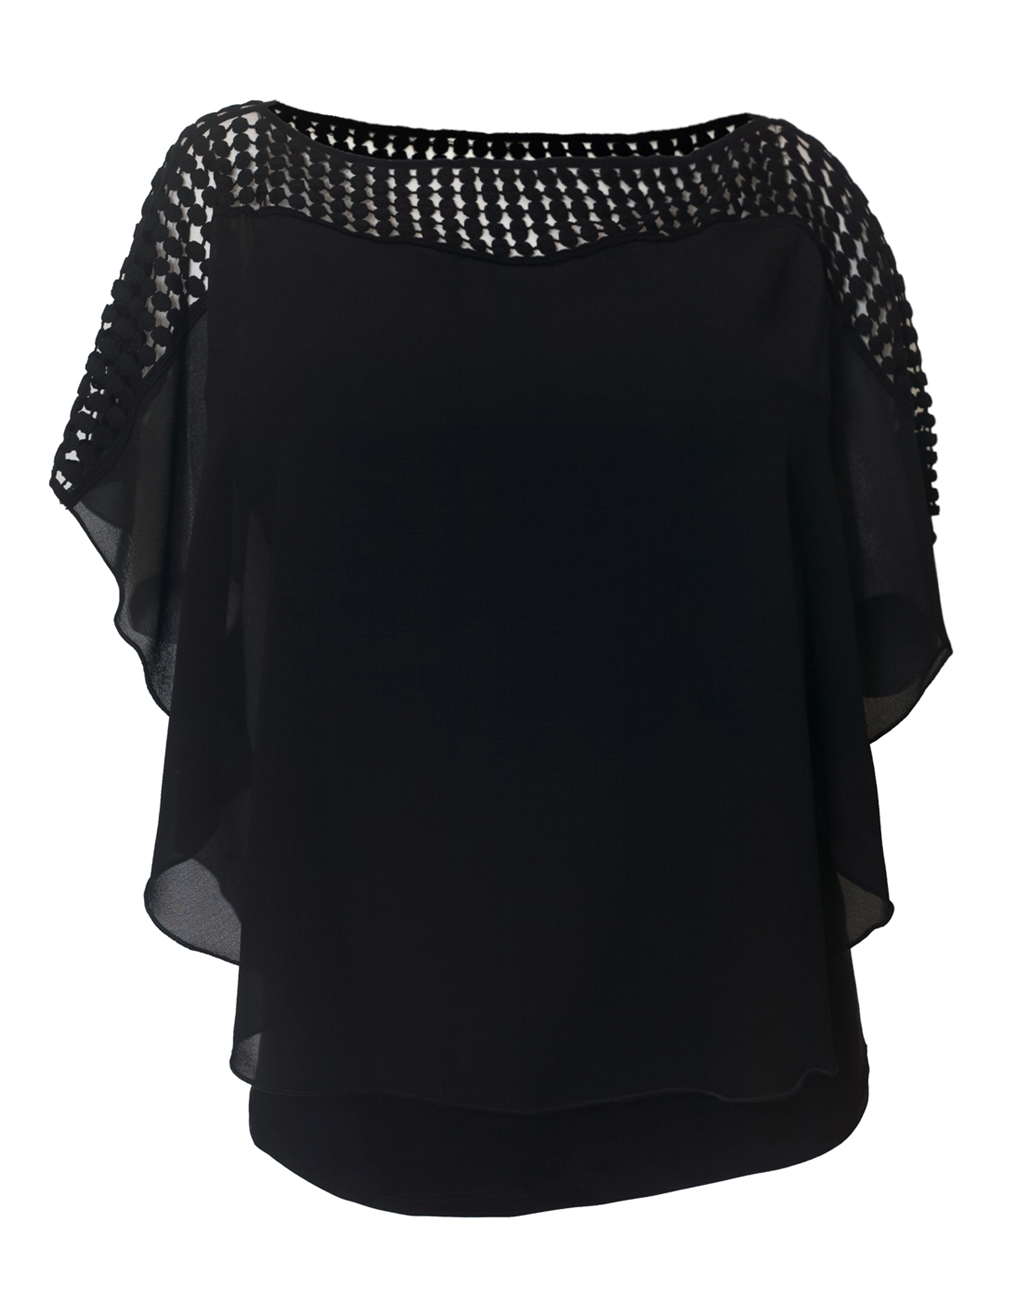 Plus Size Layered Poncho Top Crochet Shoulder Black 18528